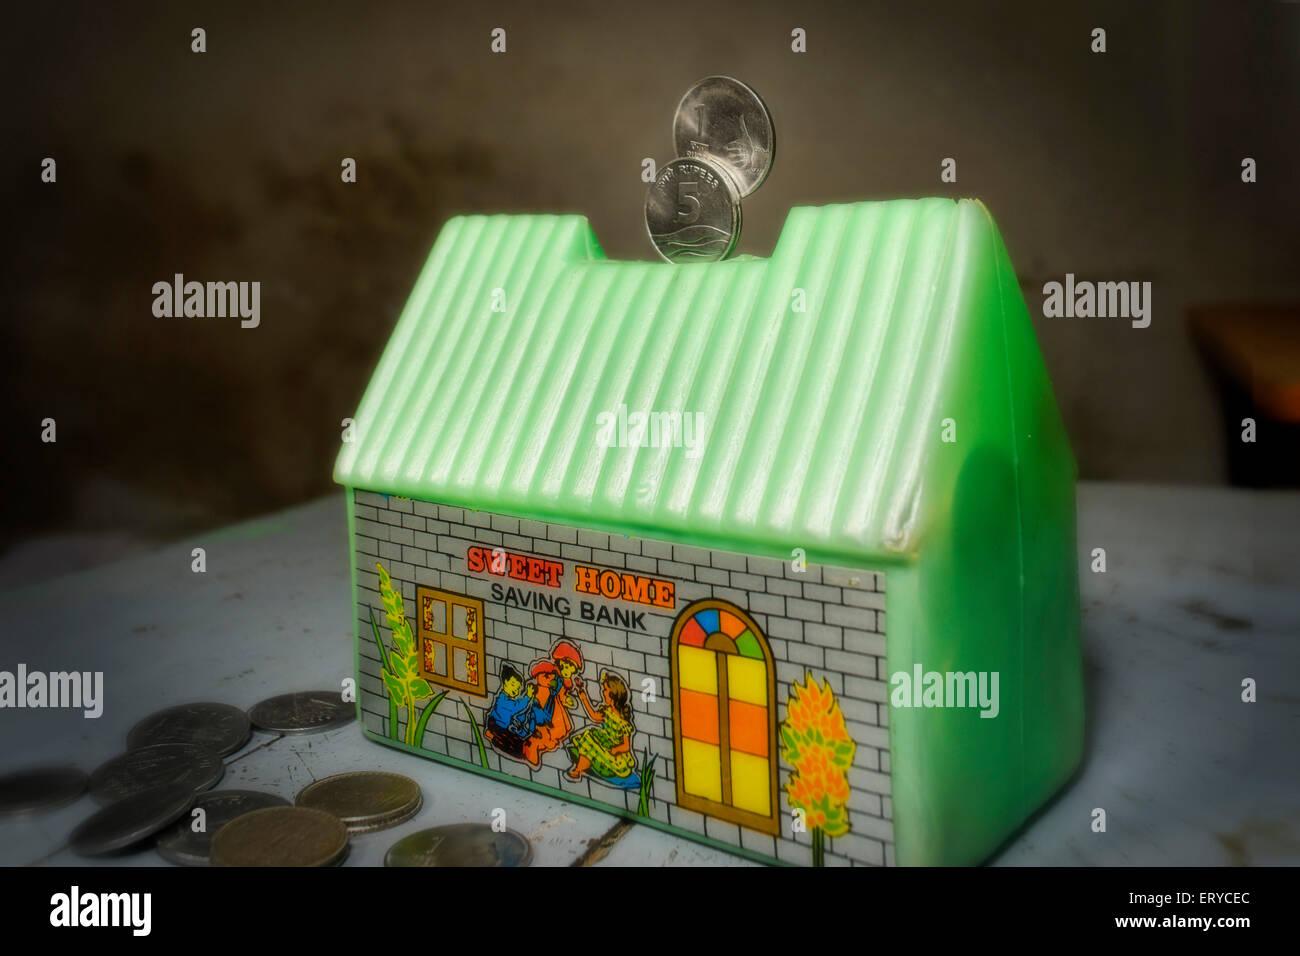 Concept ; money saving home ; saving bank ; India - Stock Image